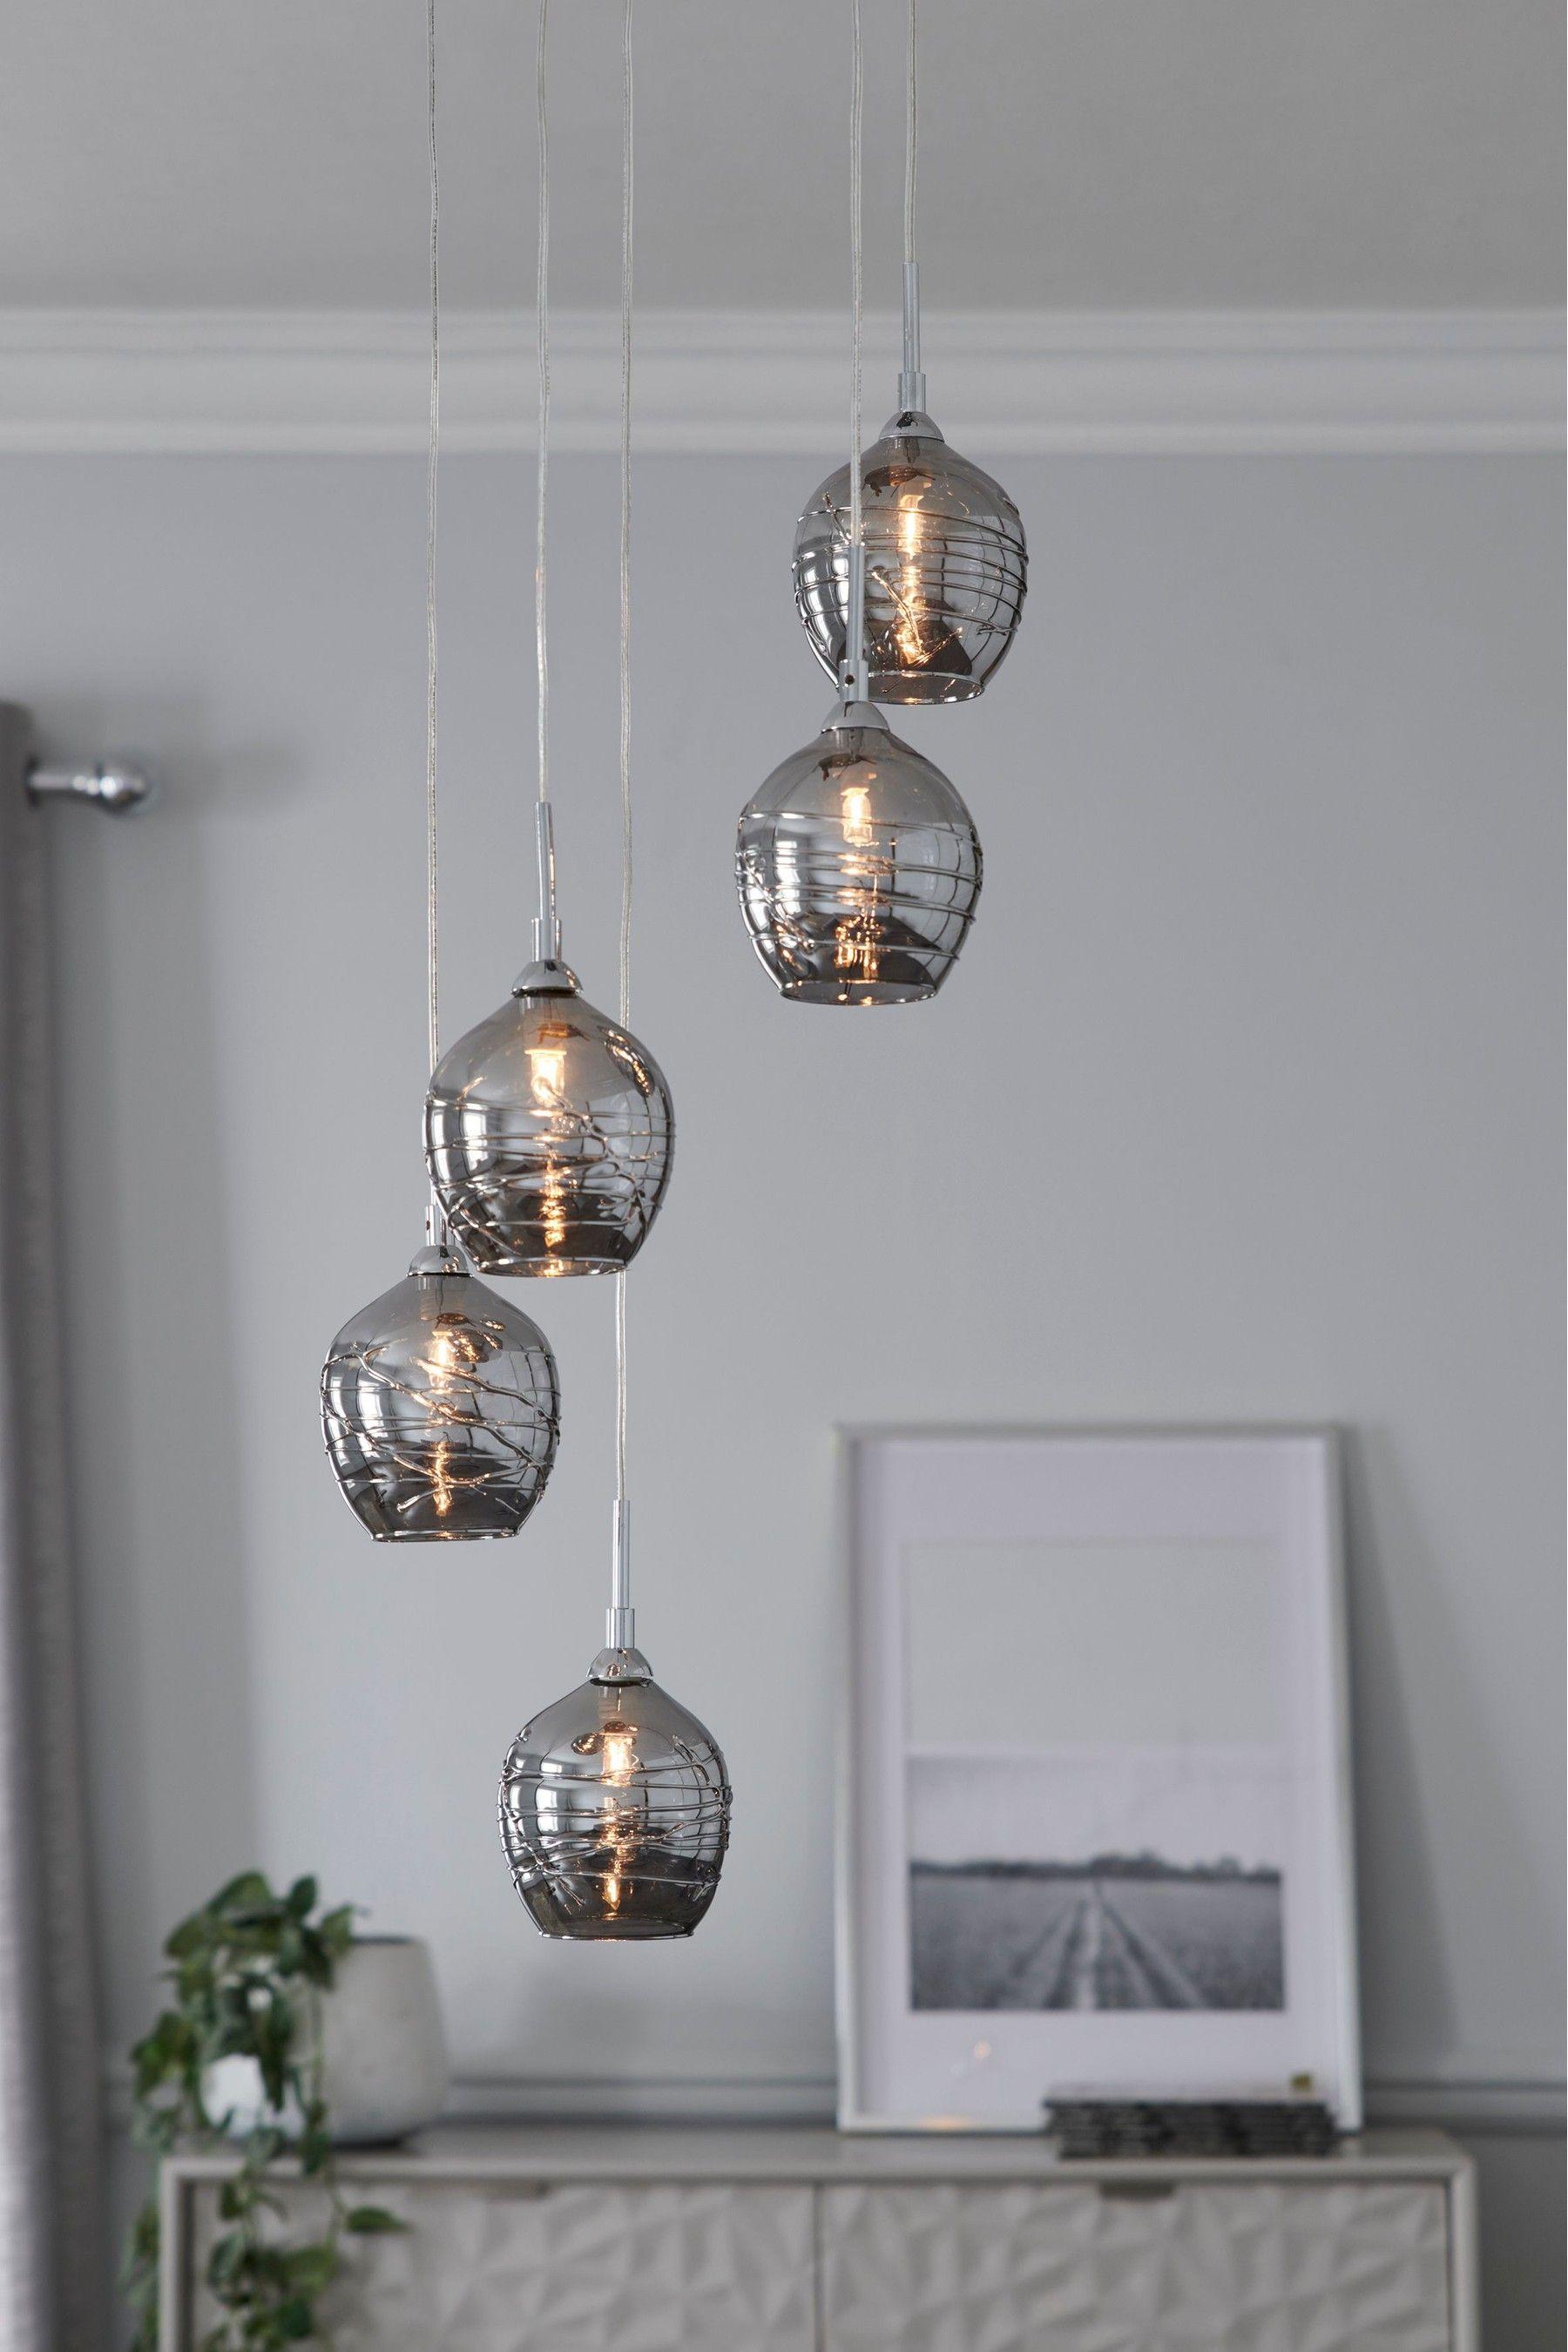 Drizzle Cluster Pendant Cluster Pendant Lighting Pendant Lights Uk Bathroom Pendant Lighting